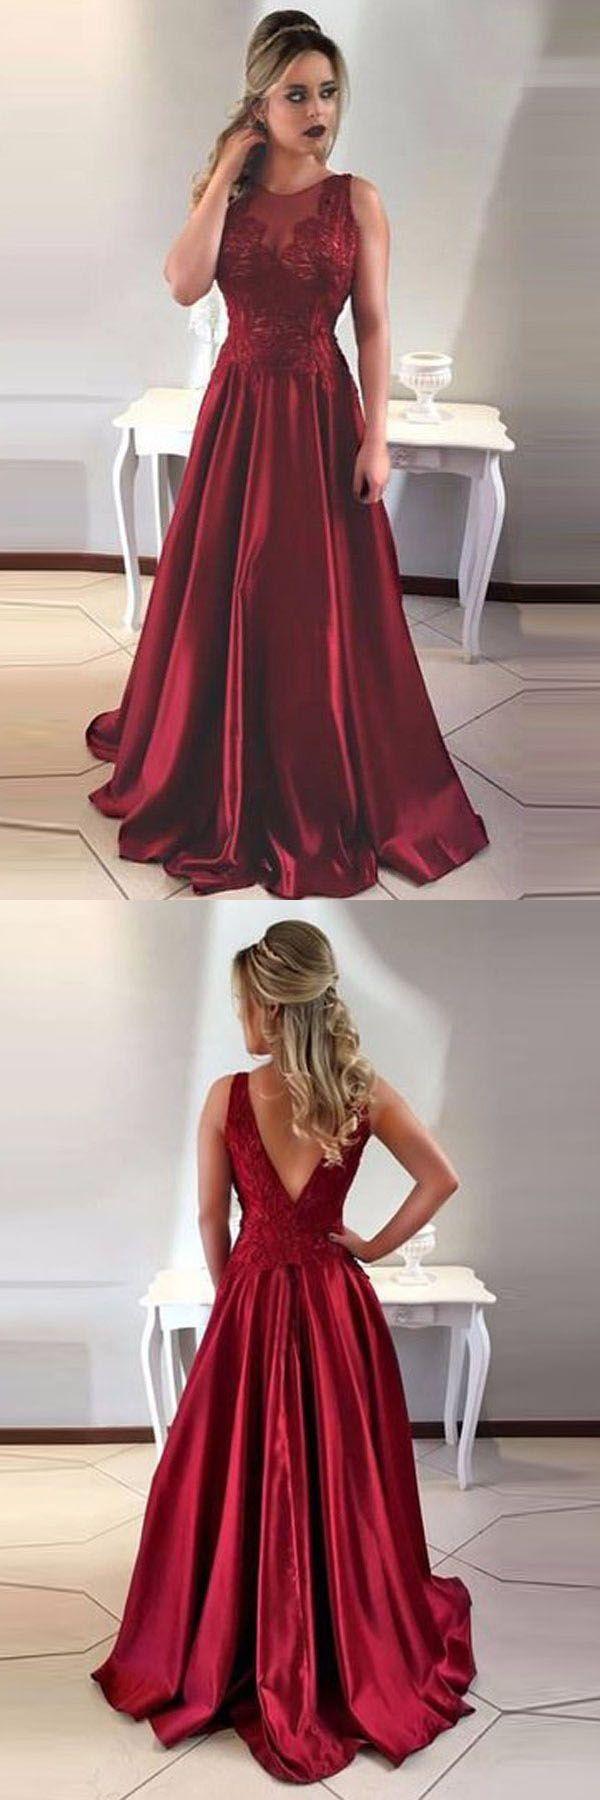 Long lace prom dresses long prom dresses longpromdresses